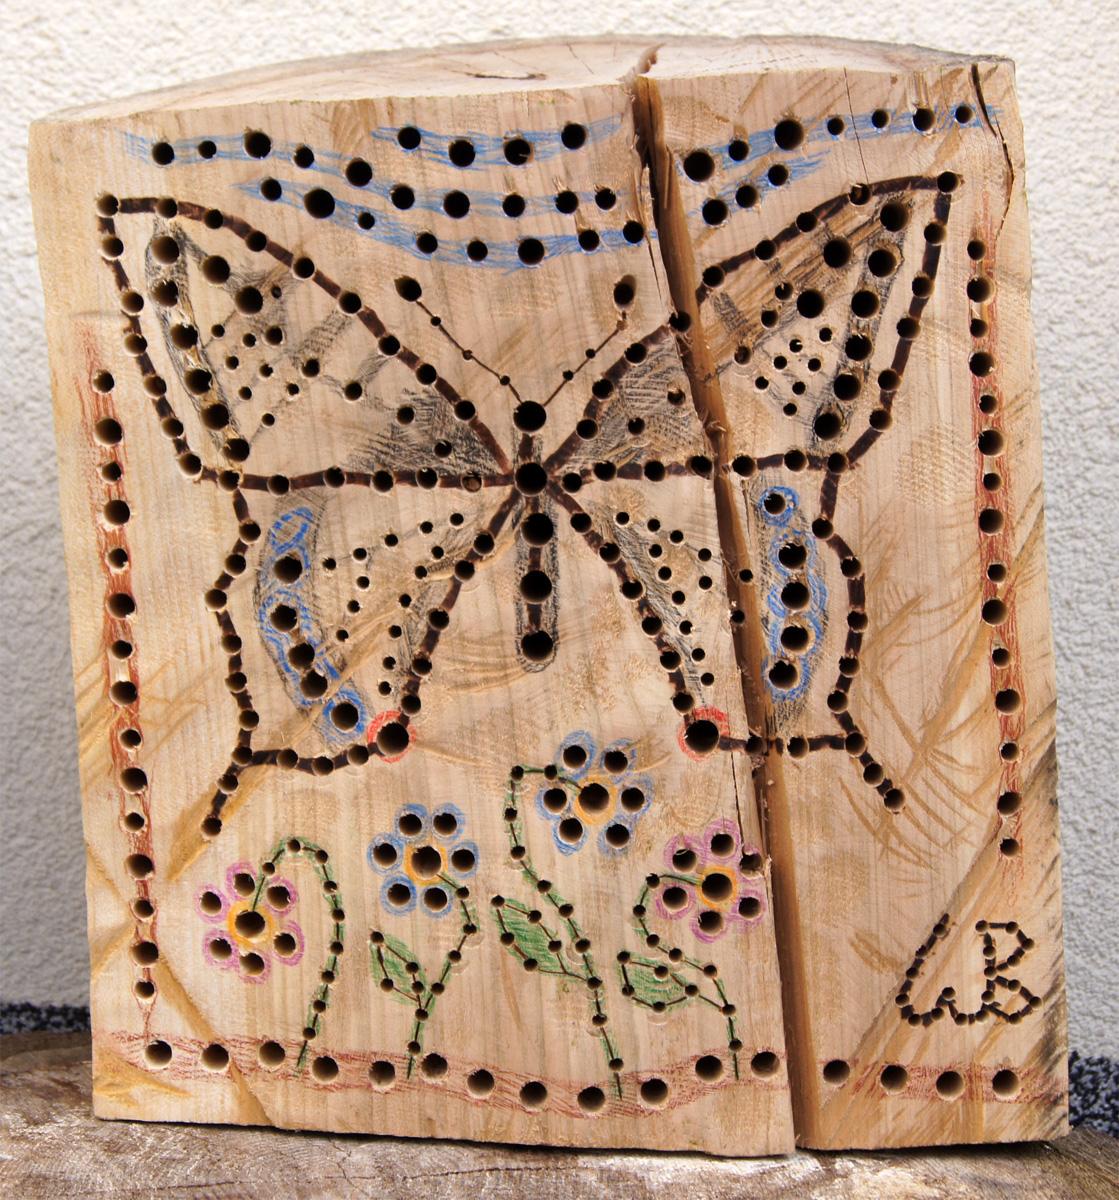 Nistblock Schmetterling Fuchsloch Kl